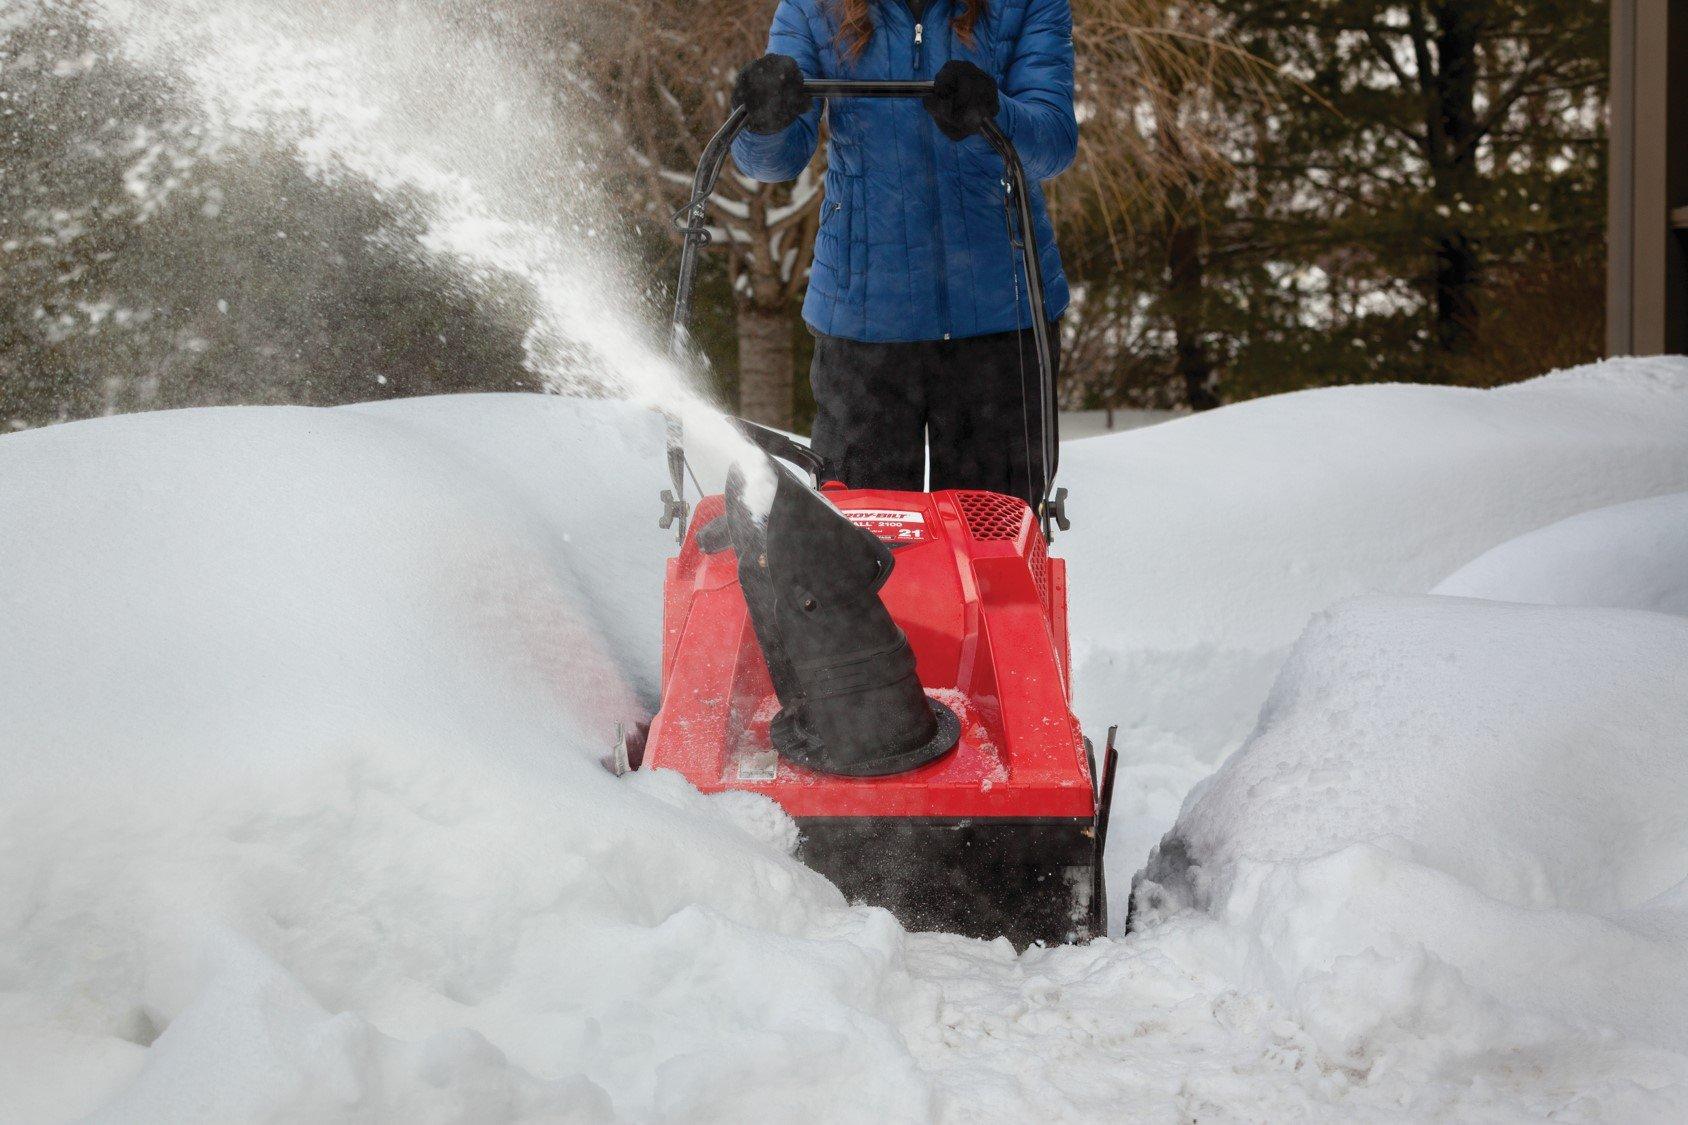 Troy-Bilt Squall 2100 208cc Single-Stage Gas Snow Thrower